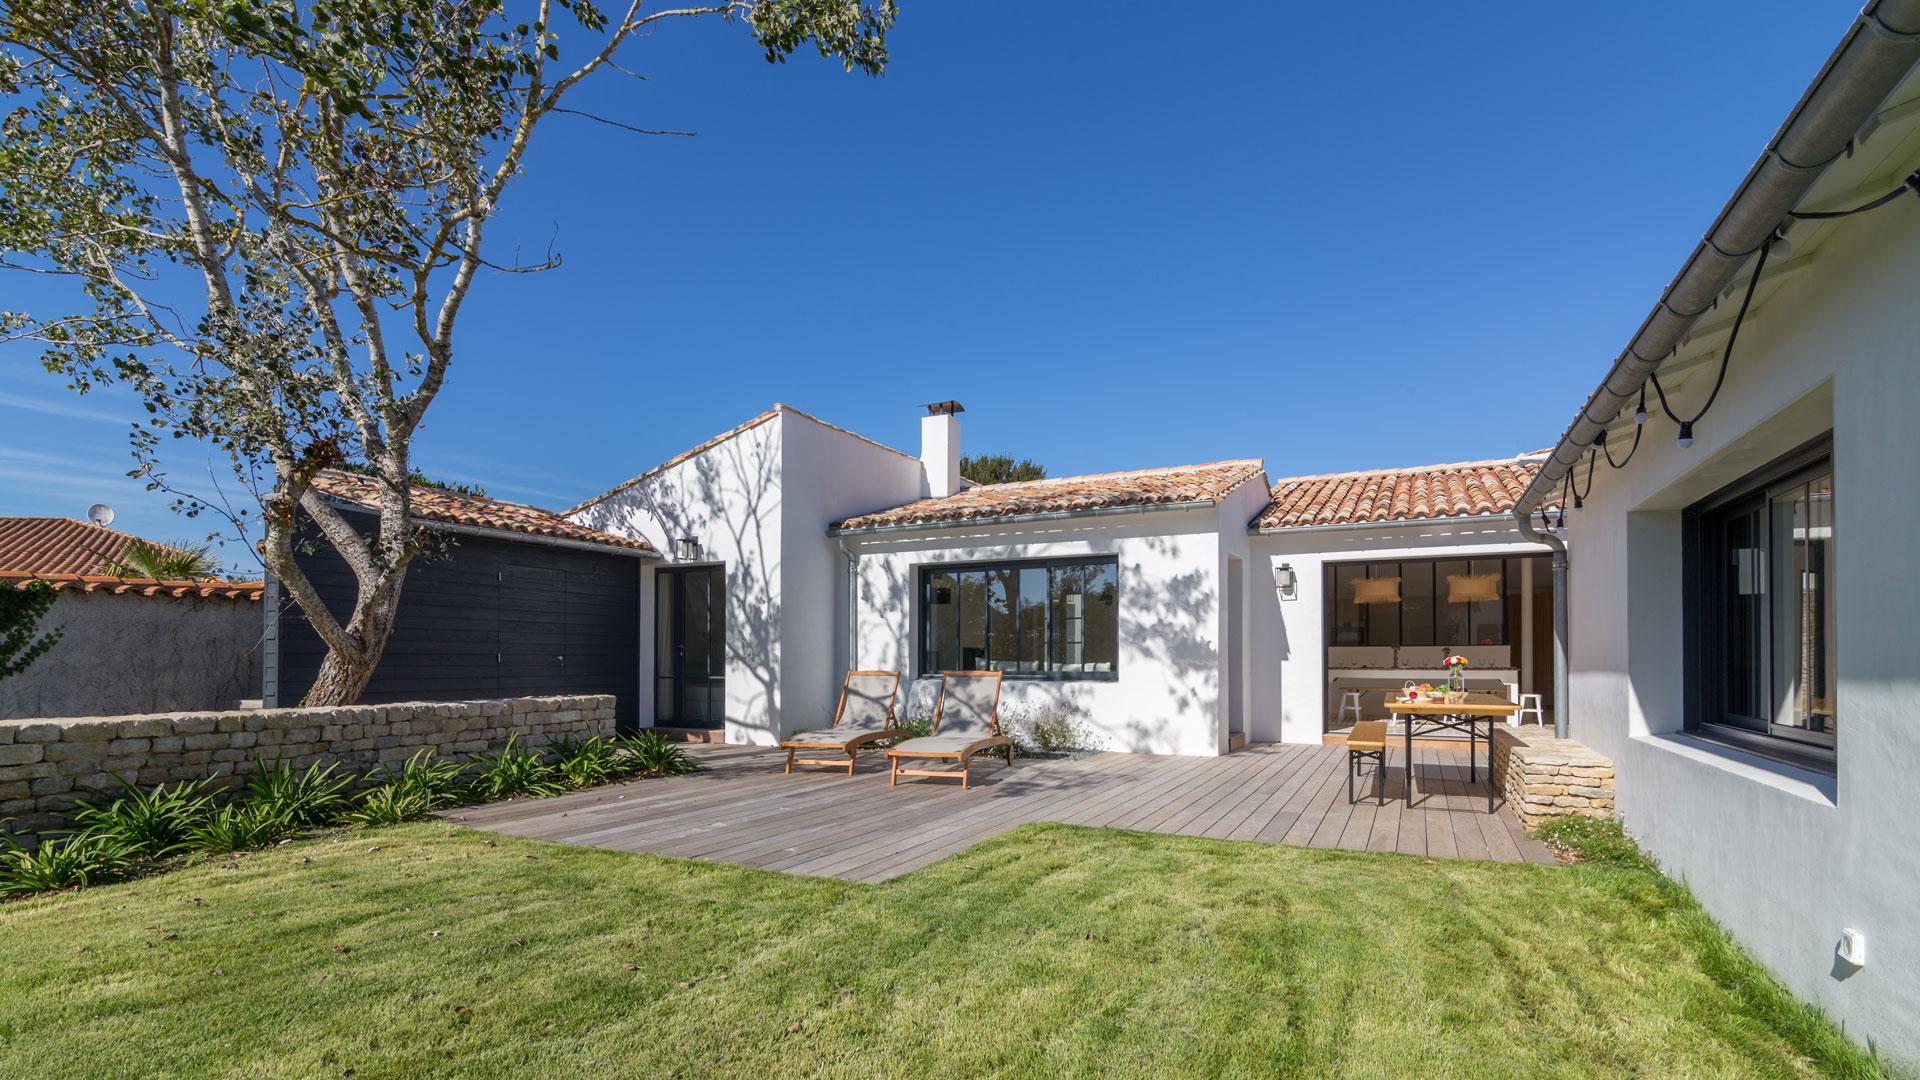 villa rimbaud villa louer le de r ars en r villanovo. Black Bedroom Furniture Sets. Home Design Ideas